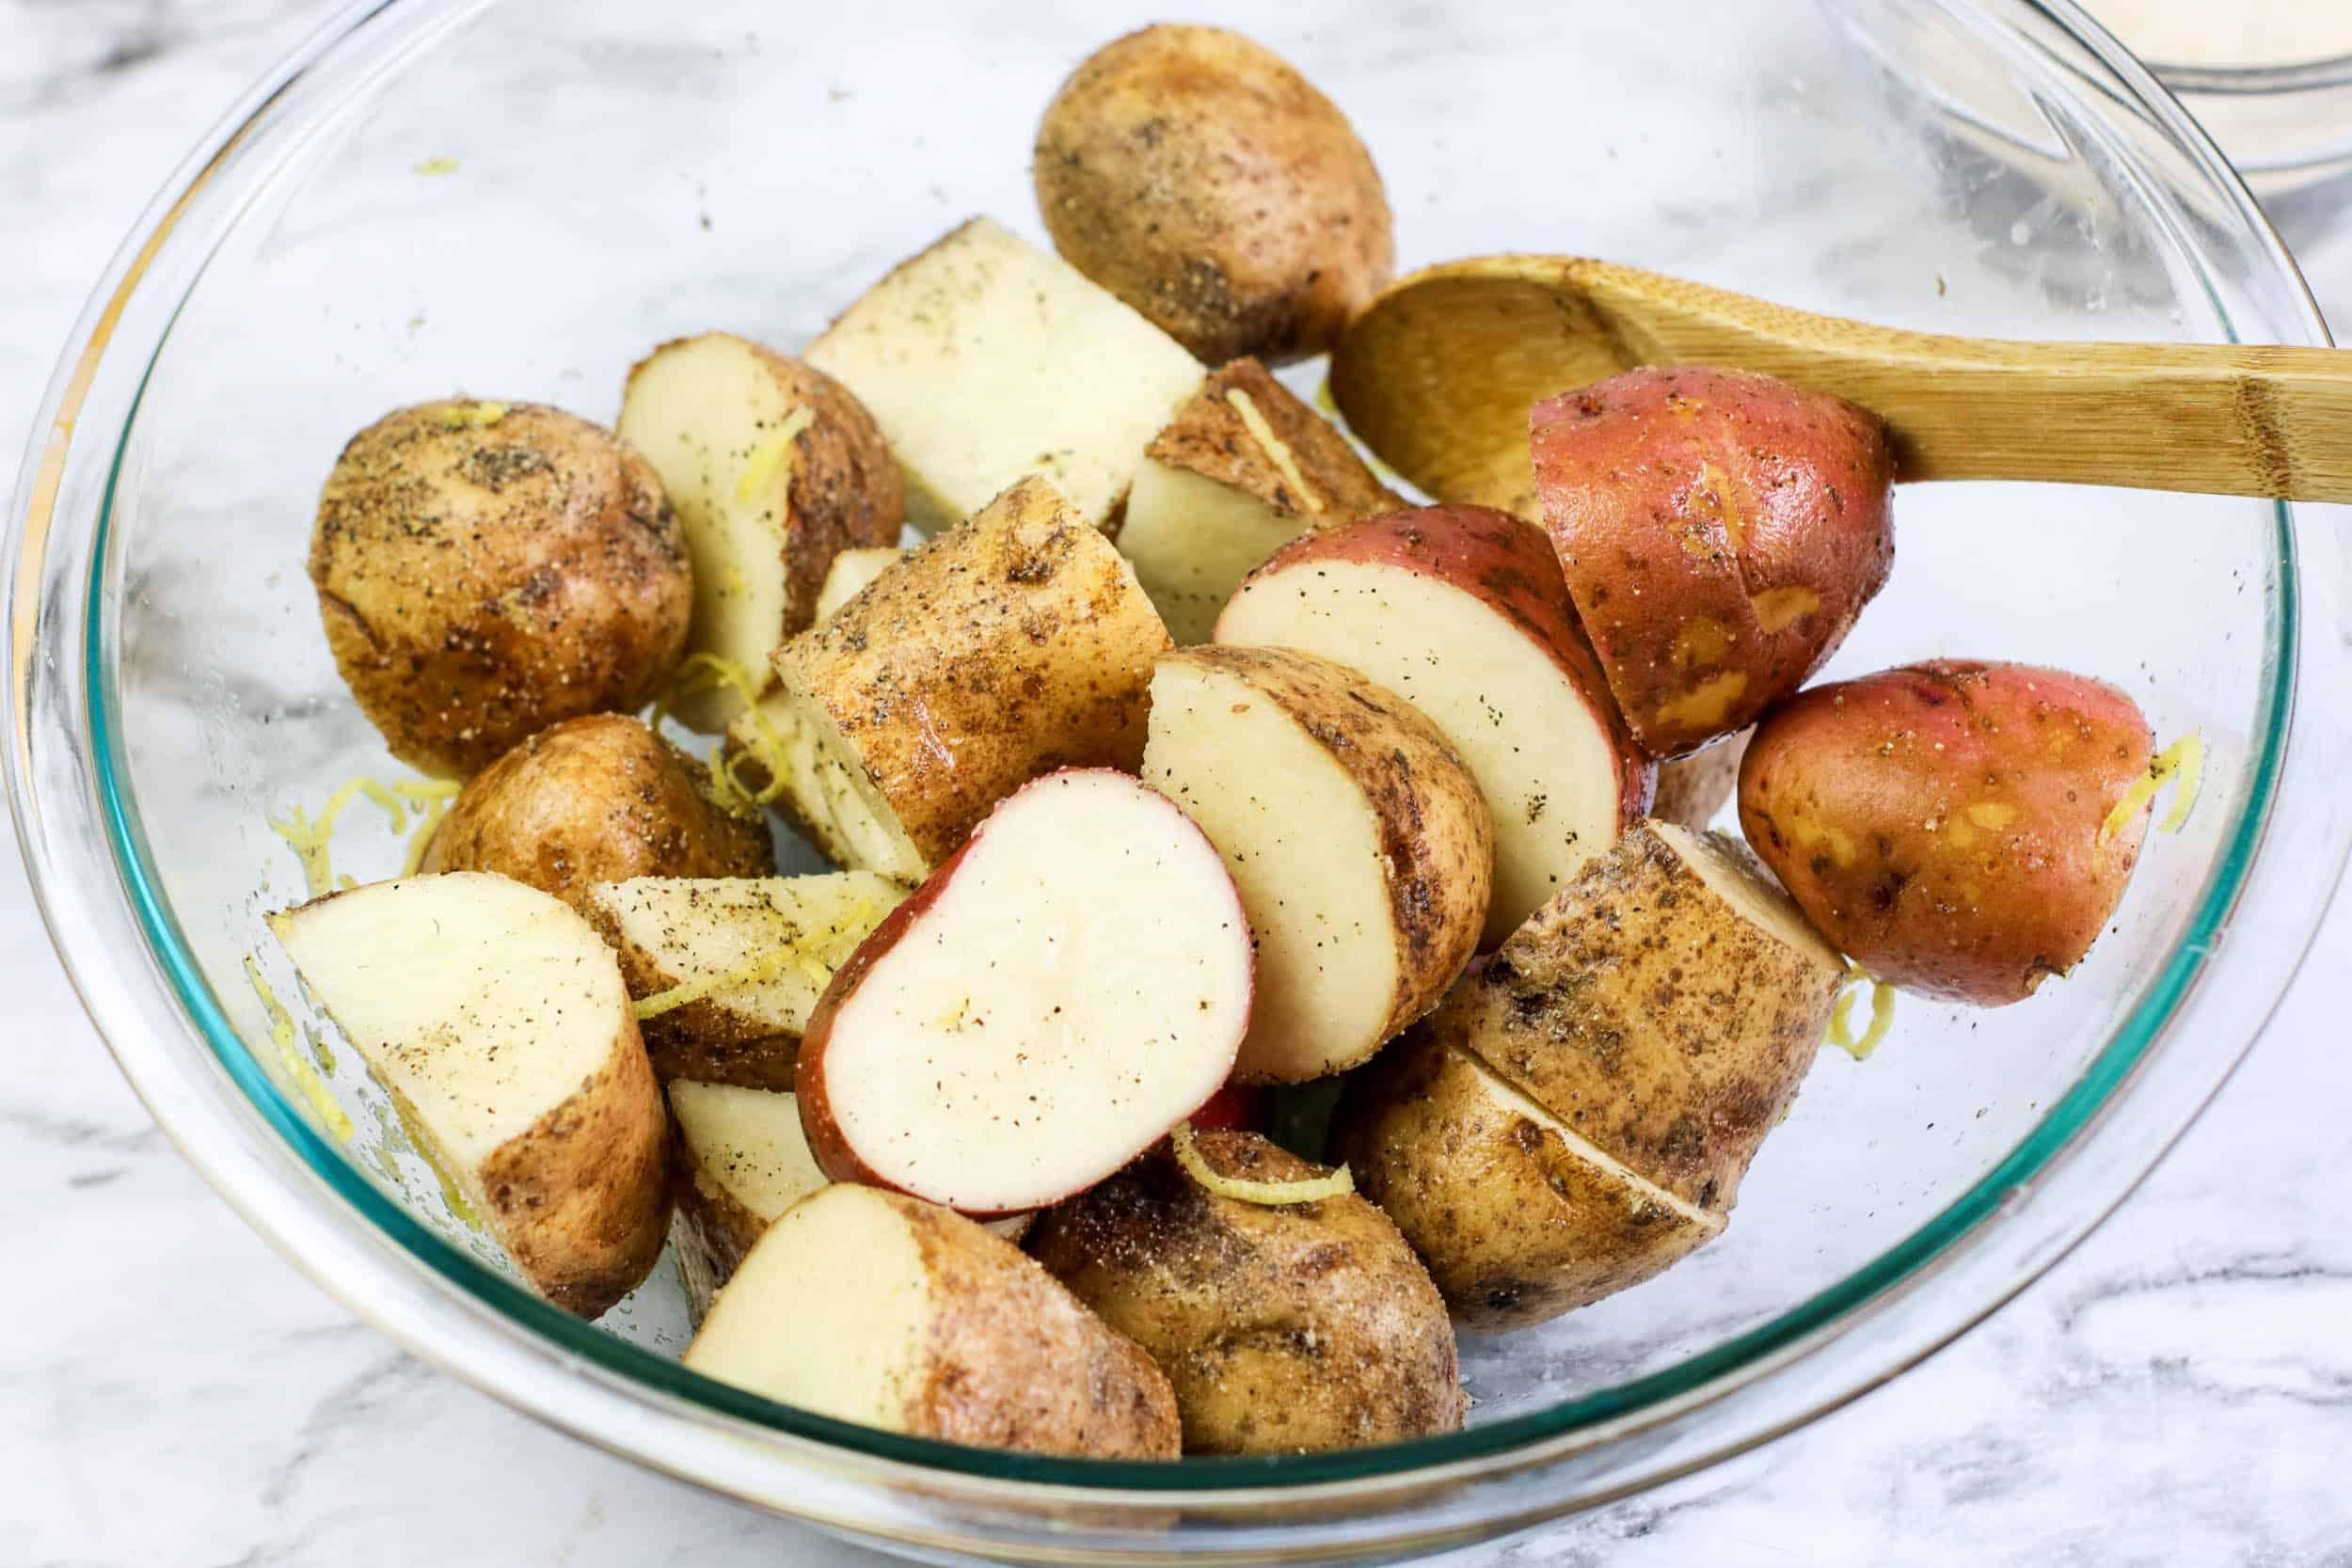 sliced potatoes in bowl